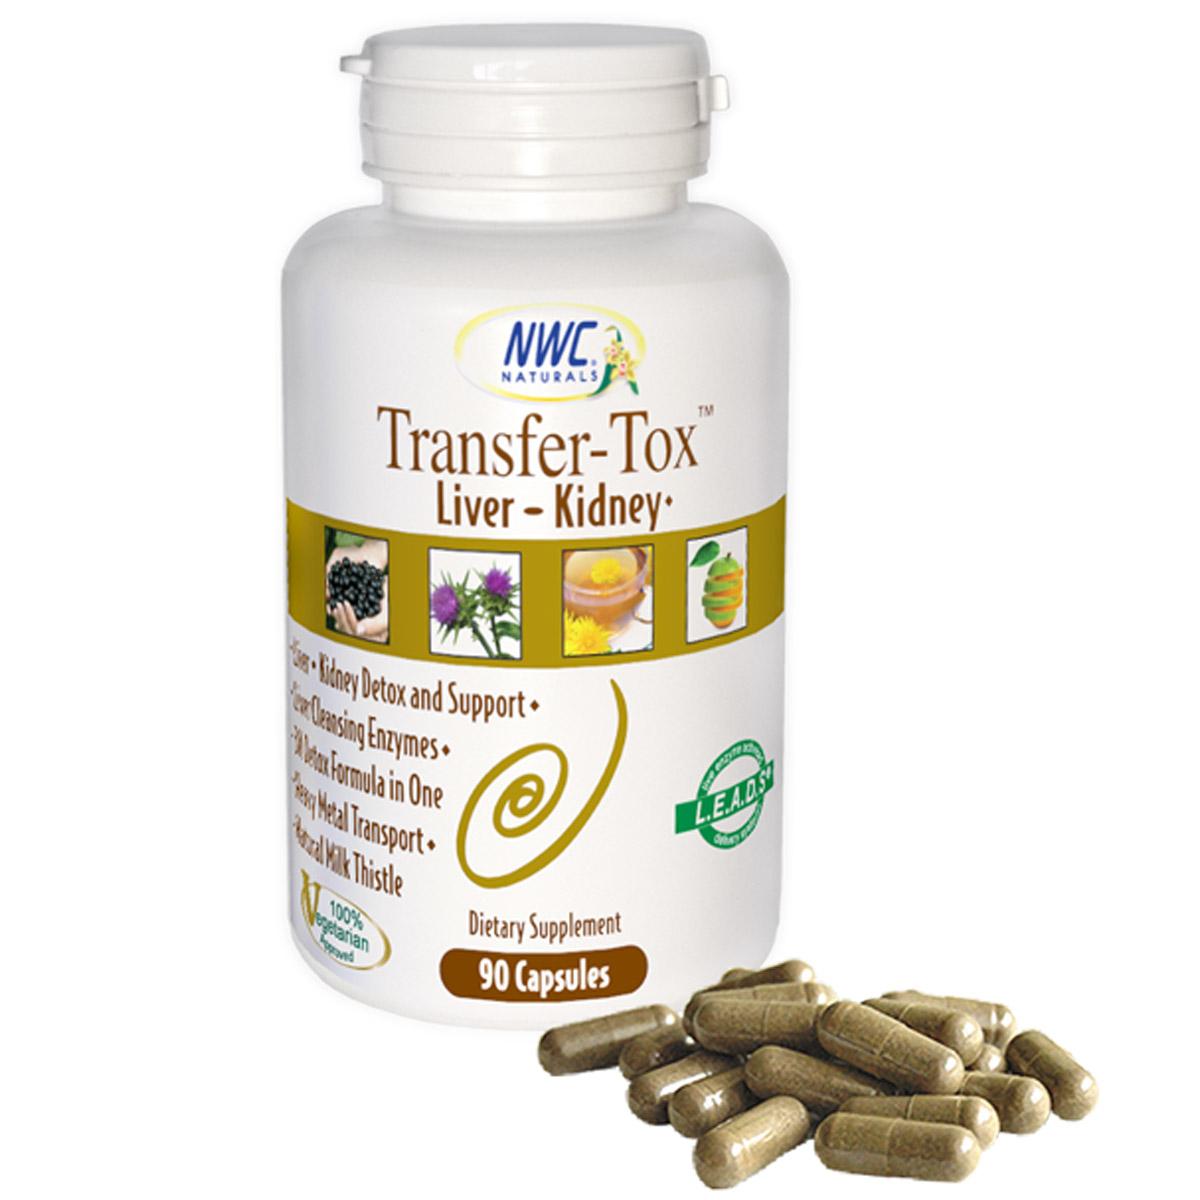 Transfer-Tox™